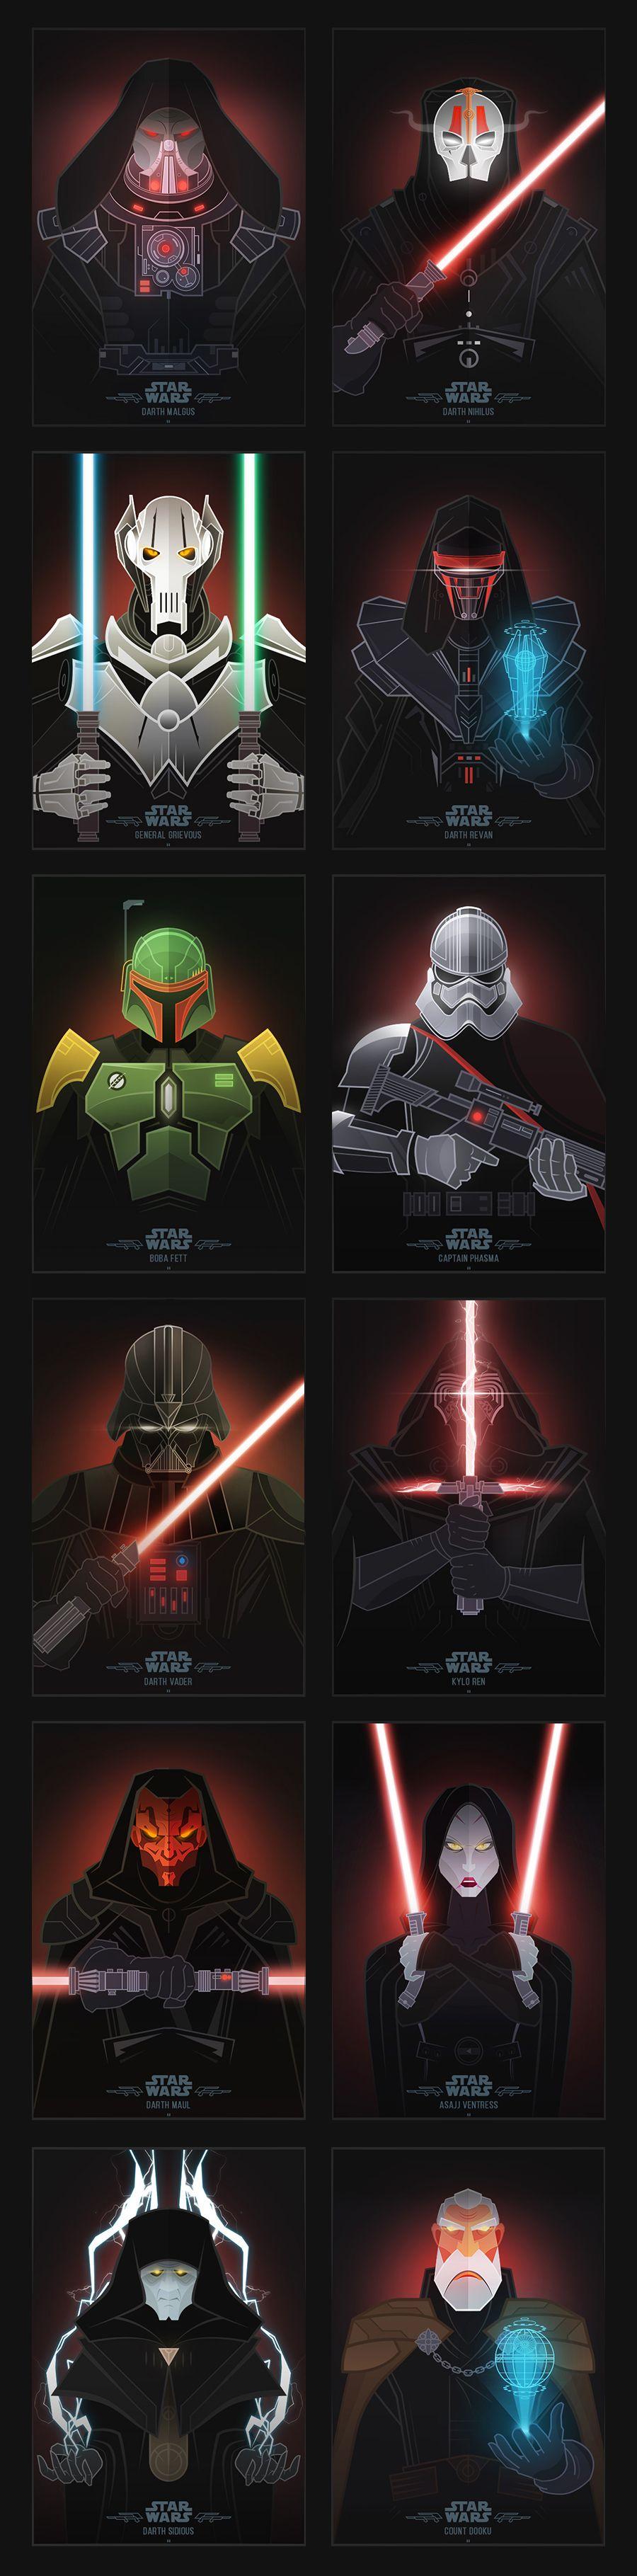 Star Wars Dark Side Illustrations | Fishfinger Creative Agency | Advertising | Branding | Design